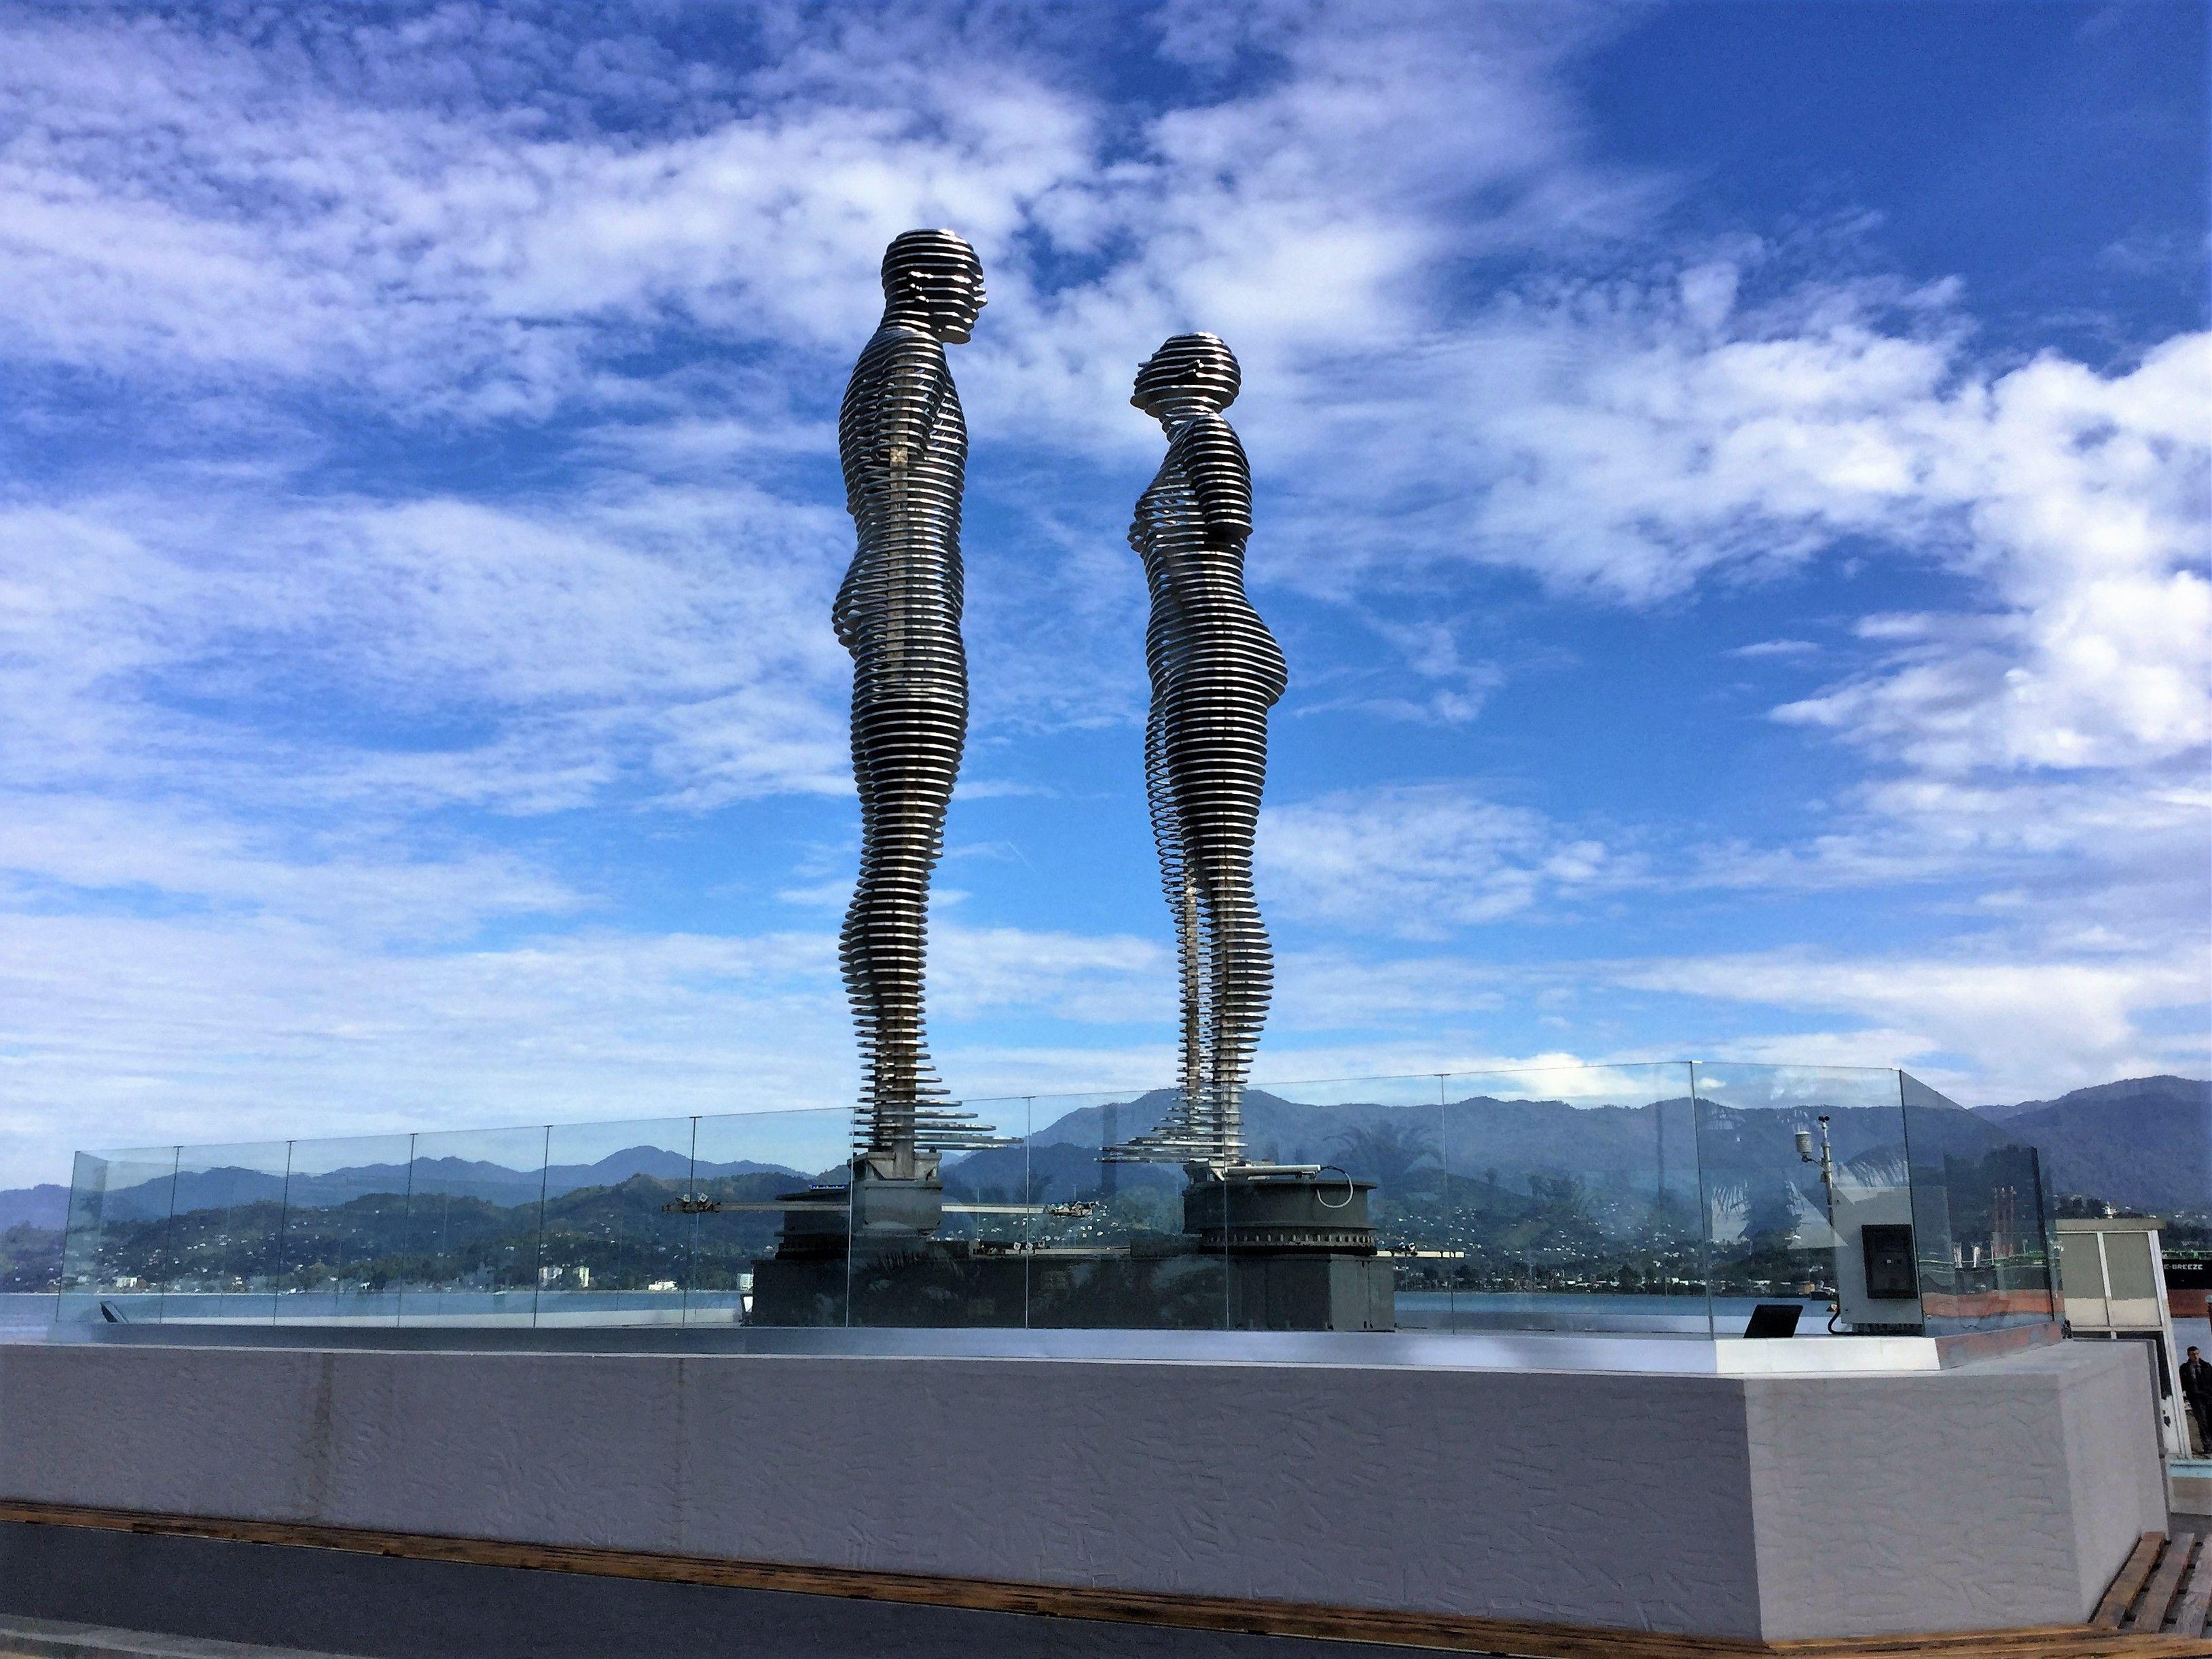 Ali and Nino, moving sculpture in Batumi, Georgia | Batumi